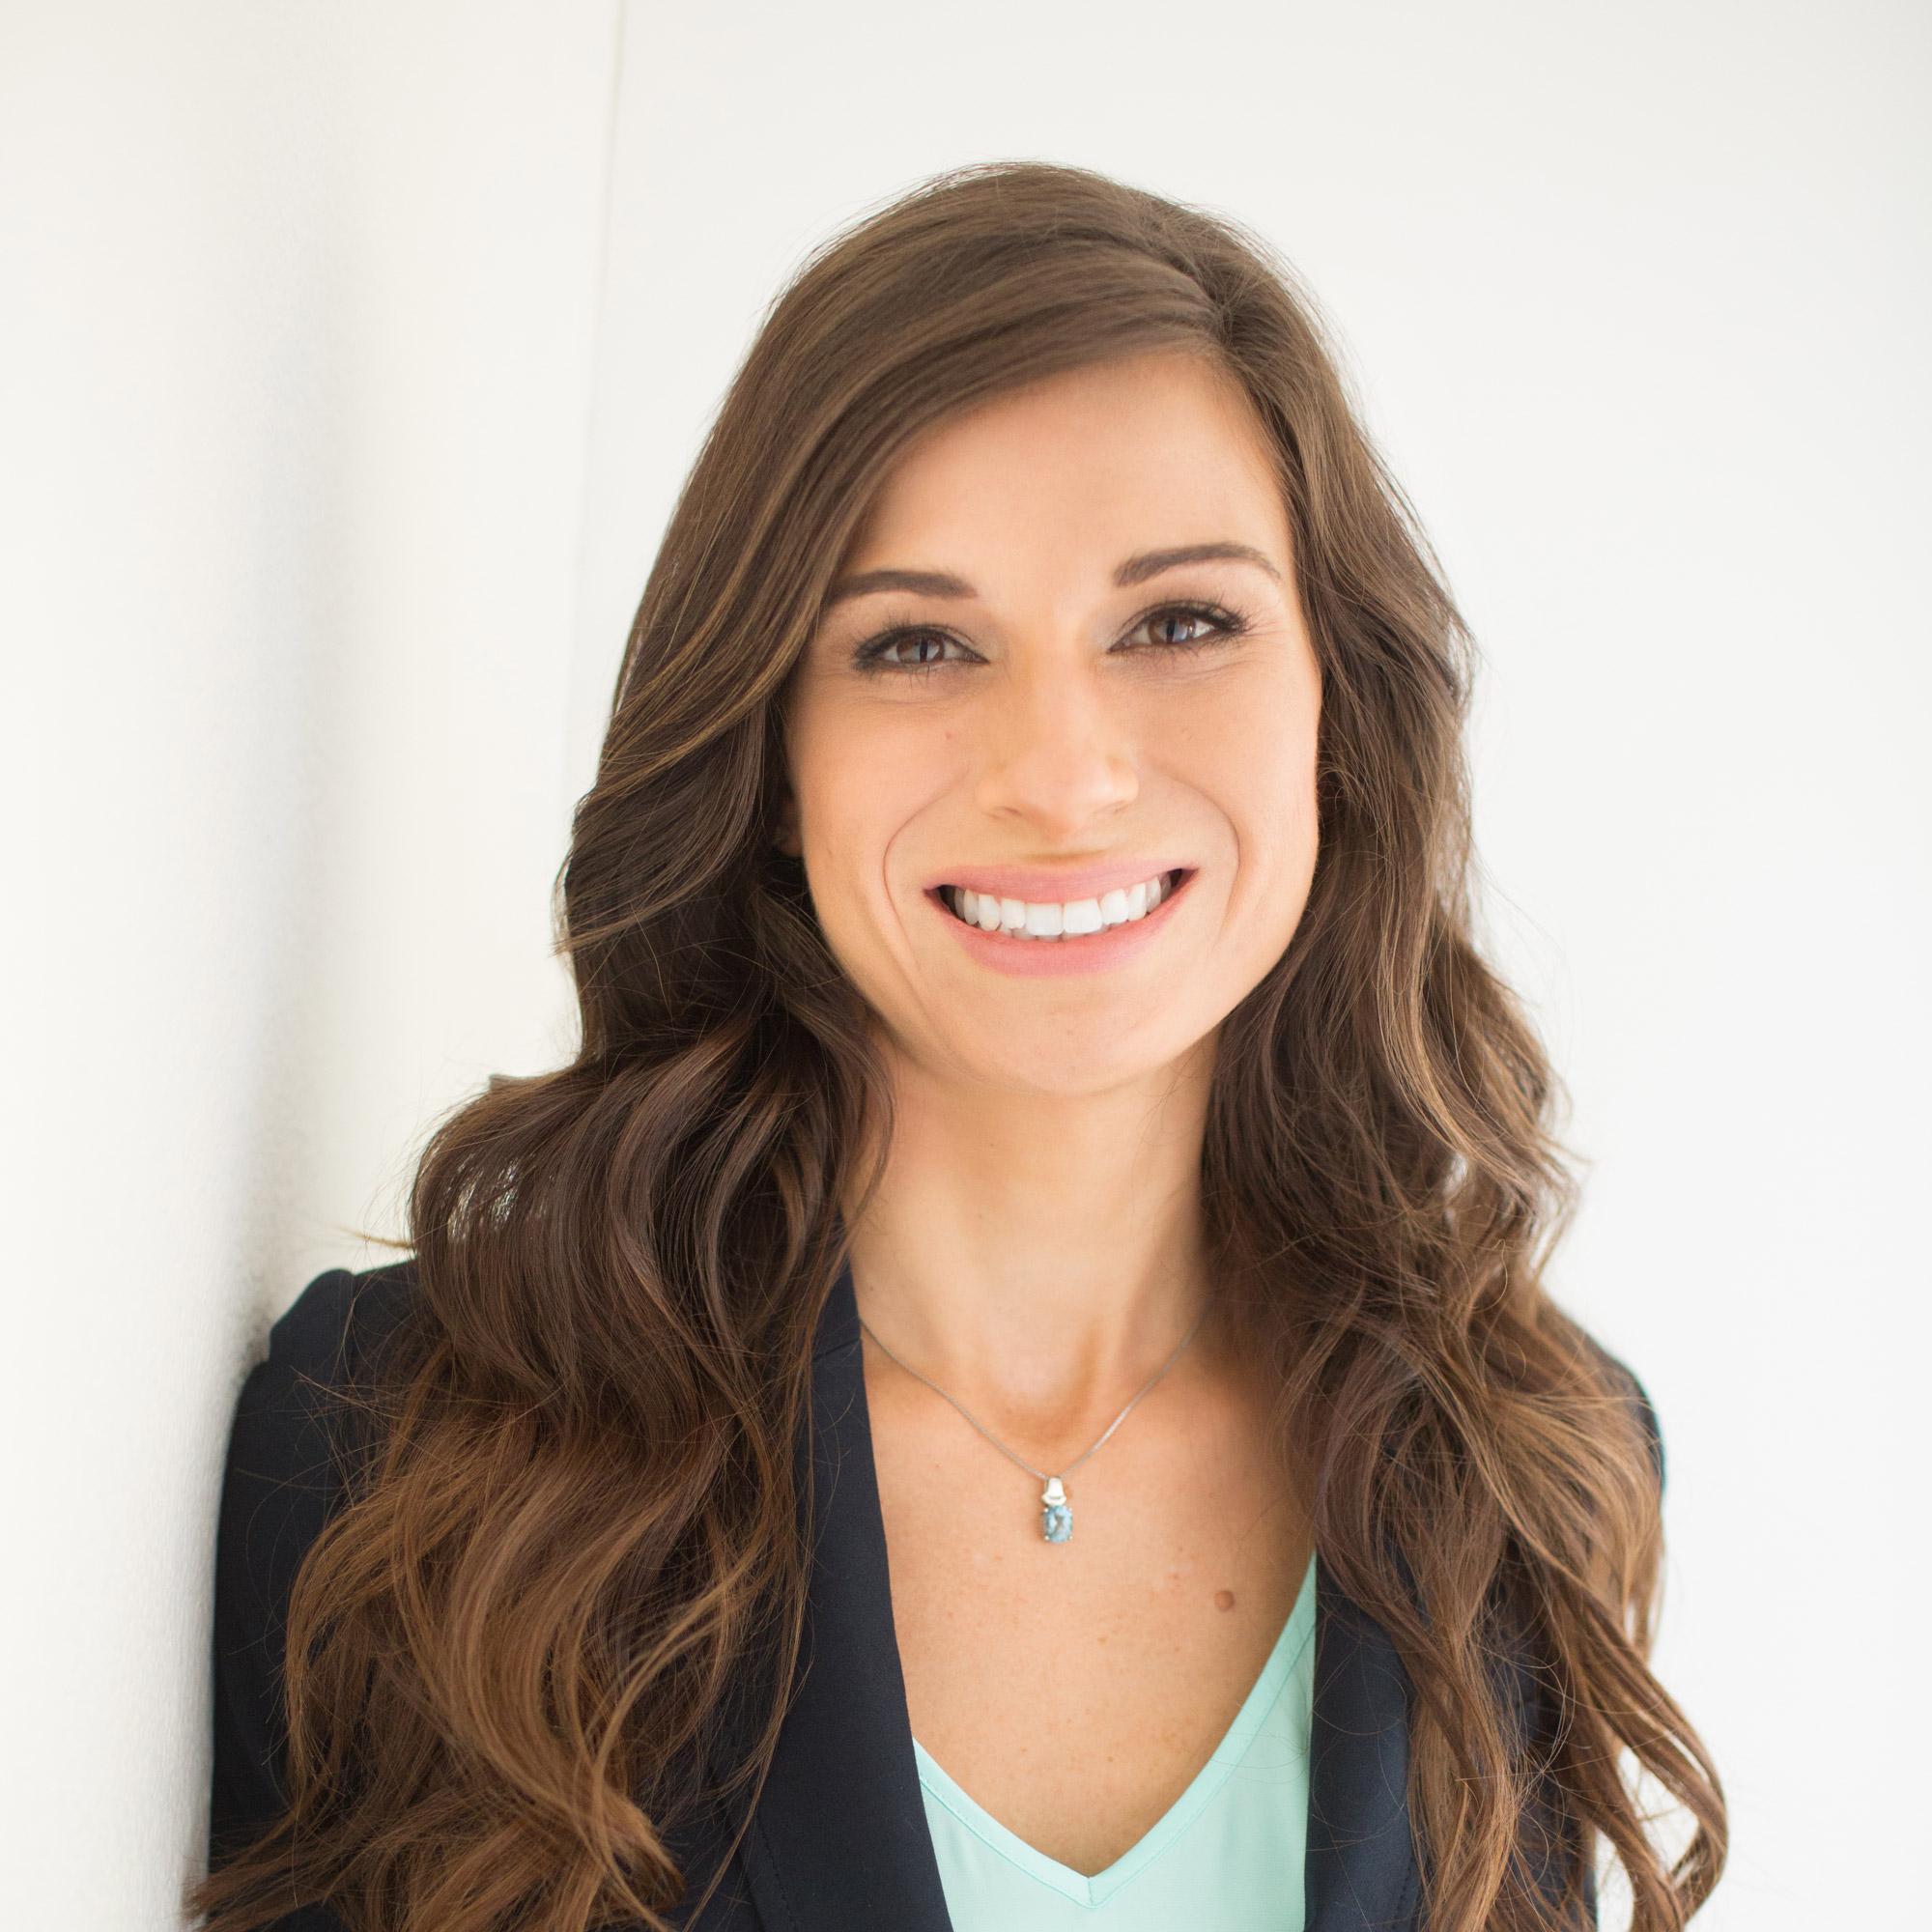 Dr. Kristi Ann Kozola Maas, M.D., M.E., FACOG | Fertility Specialists Medical Group, San Diego CA